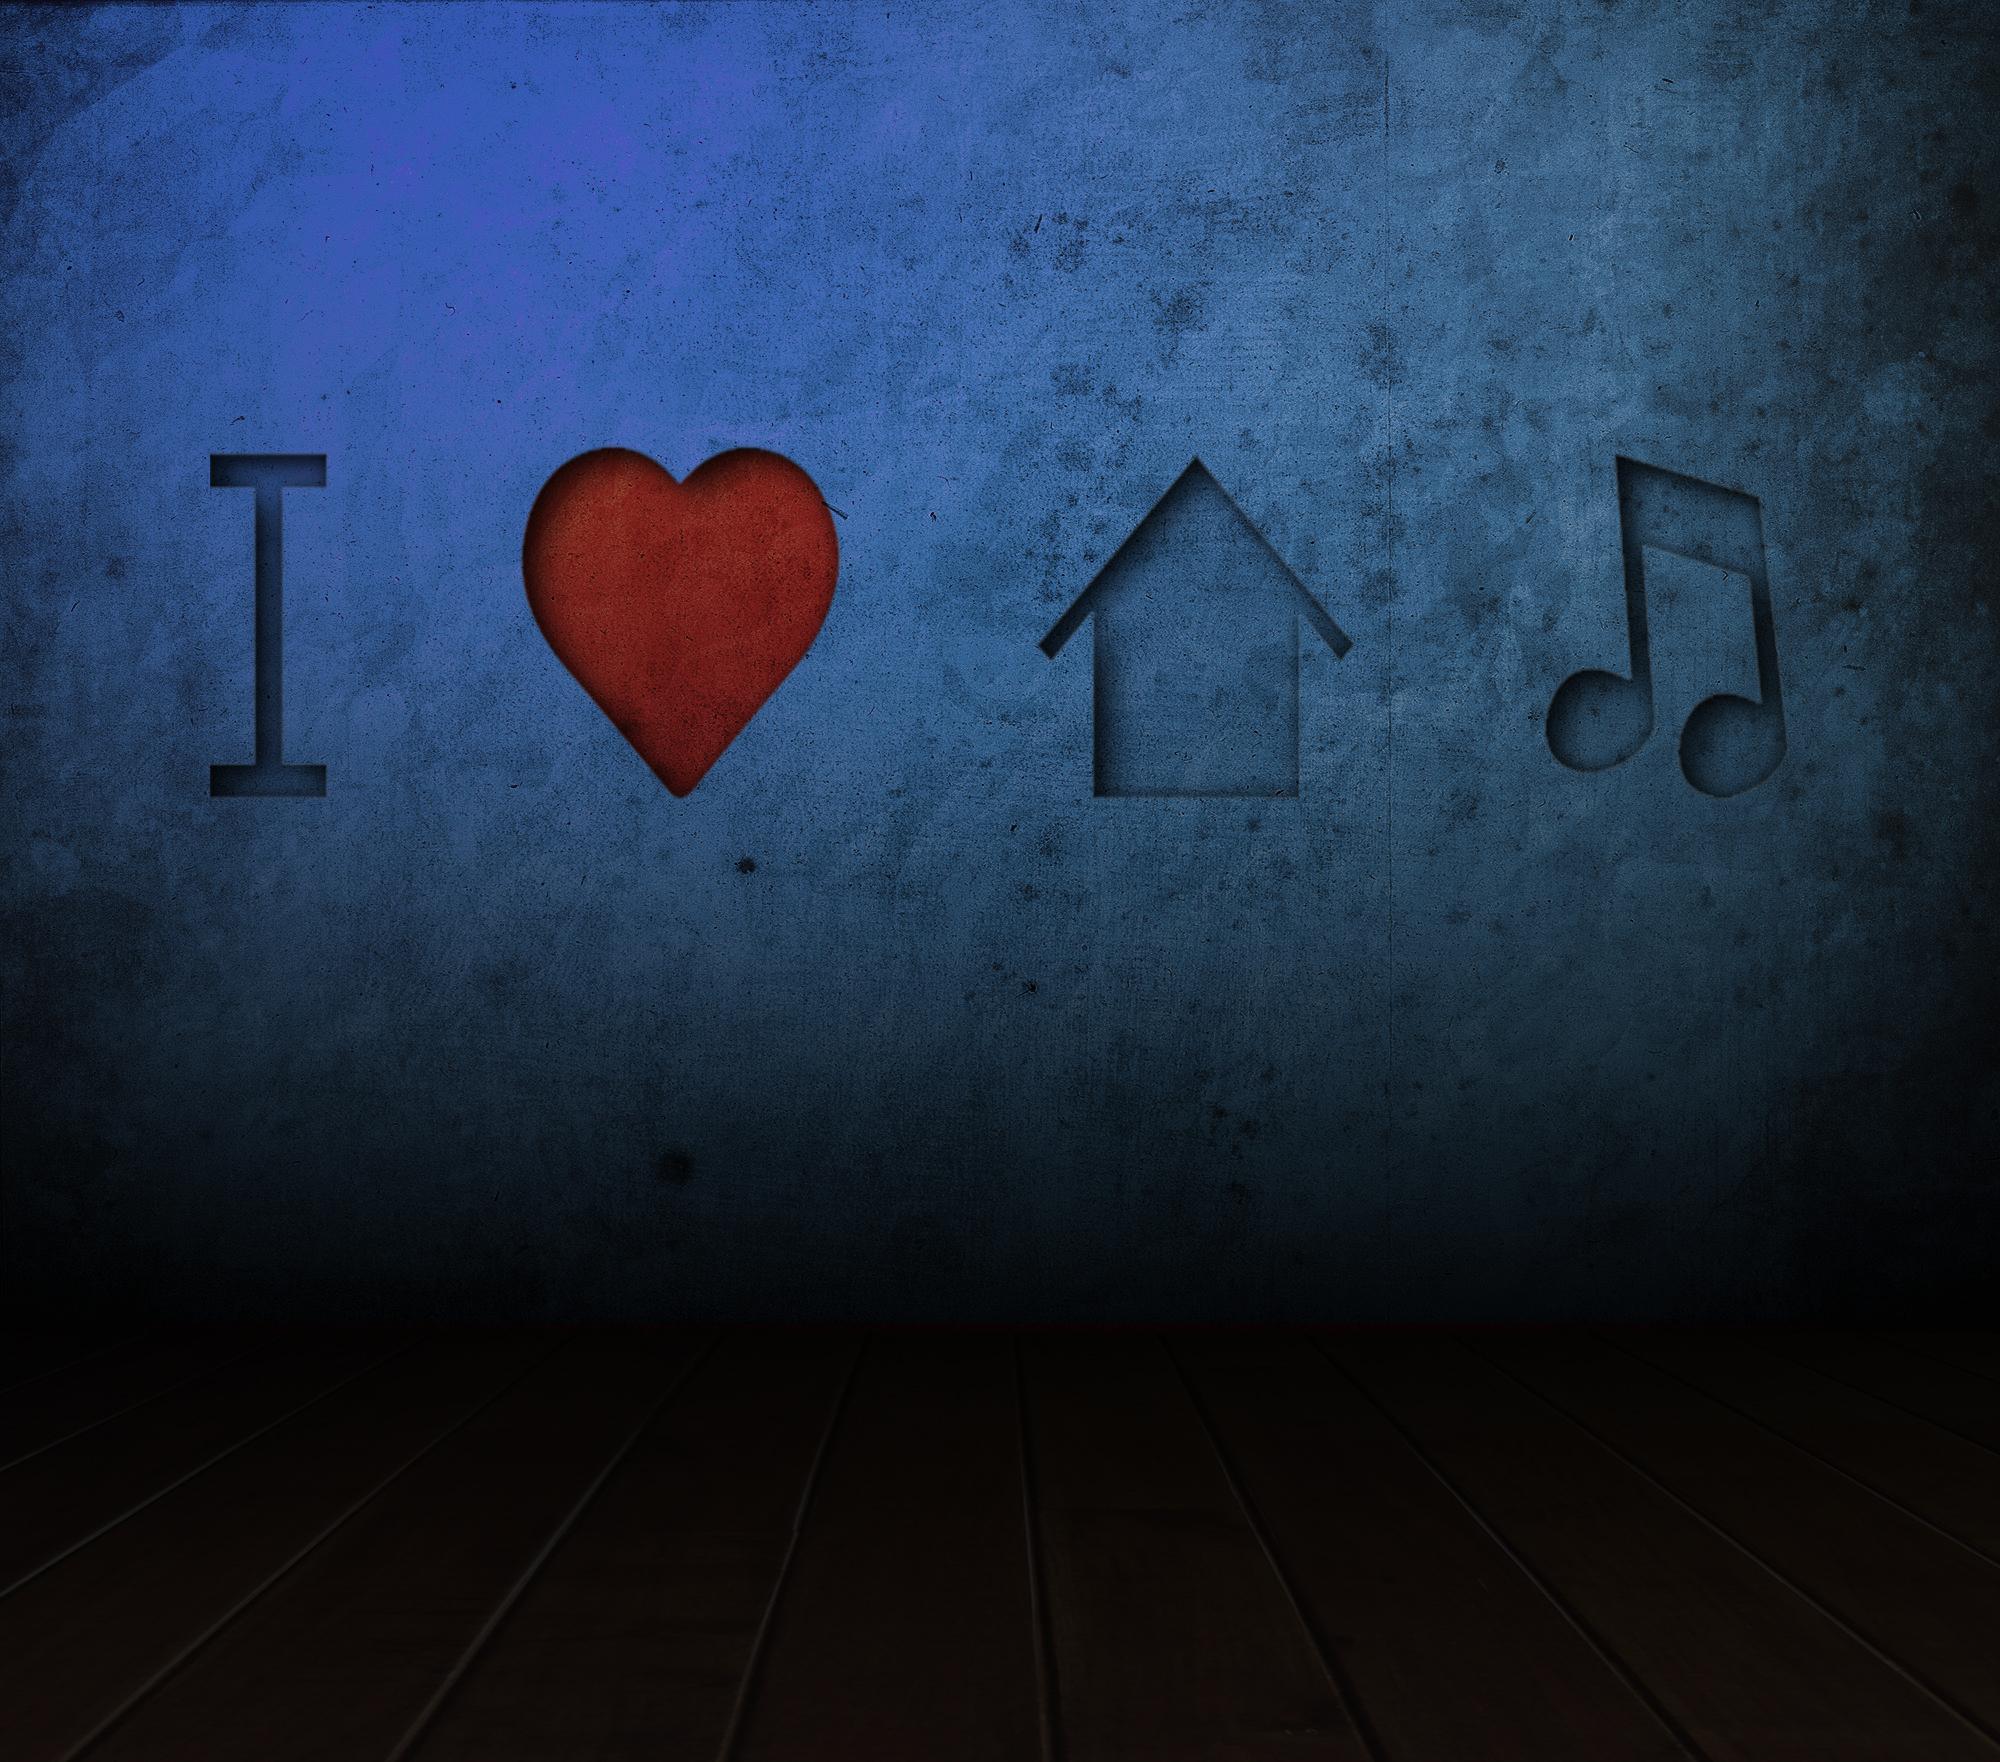 I love house music by leo designs on deviantart for House music 2009